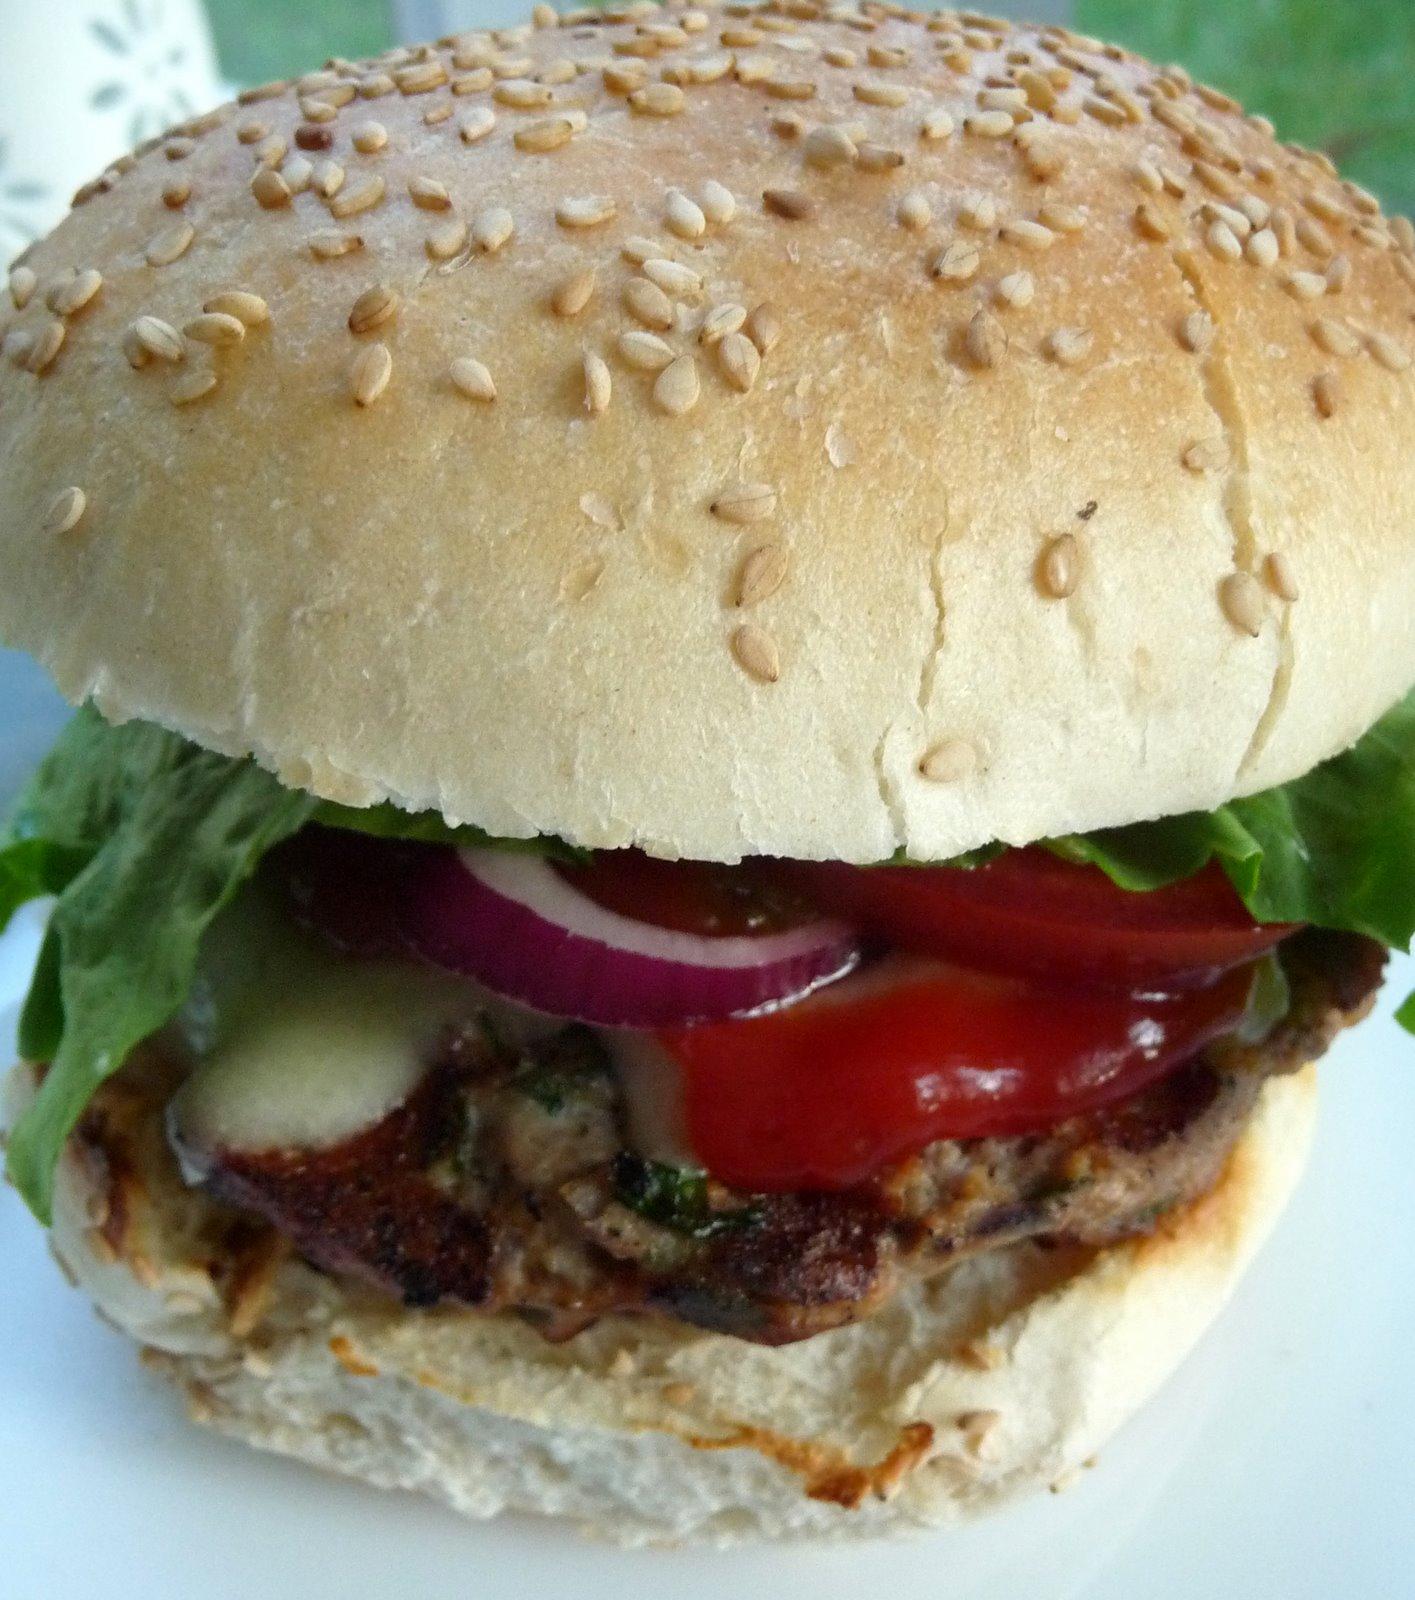 Christine's Cuisine: Herbed Turkey Burgers